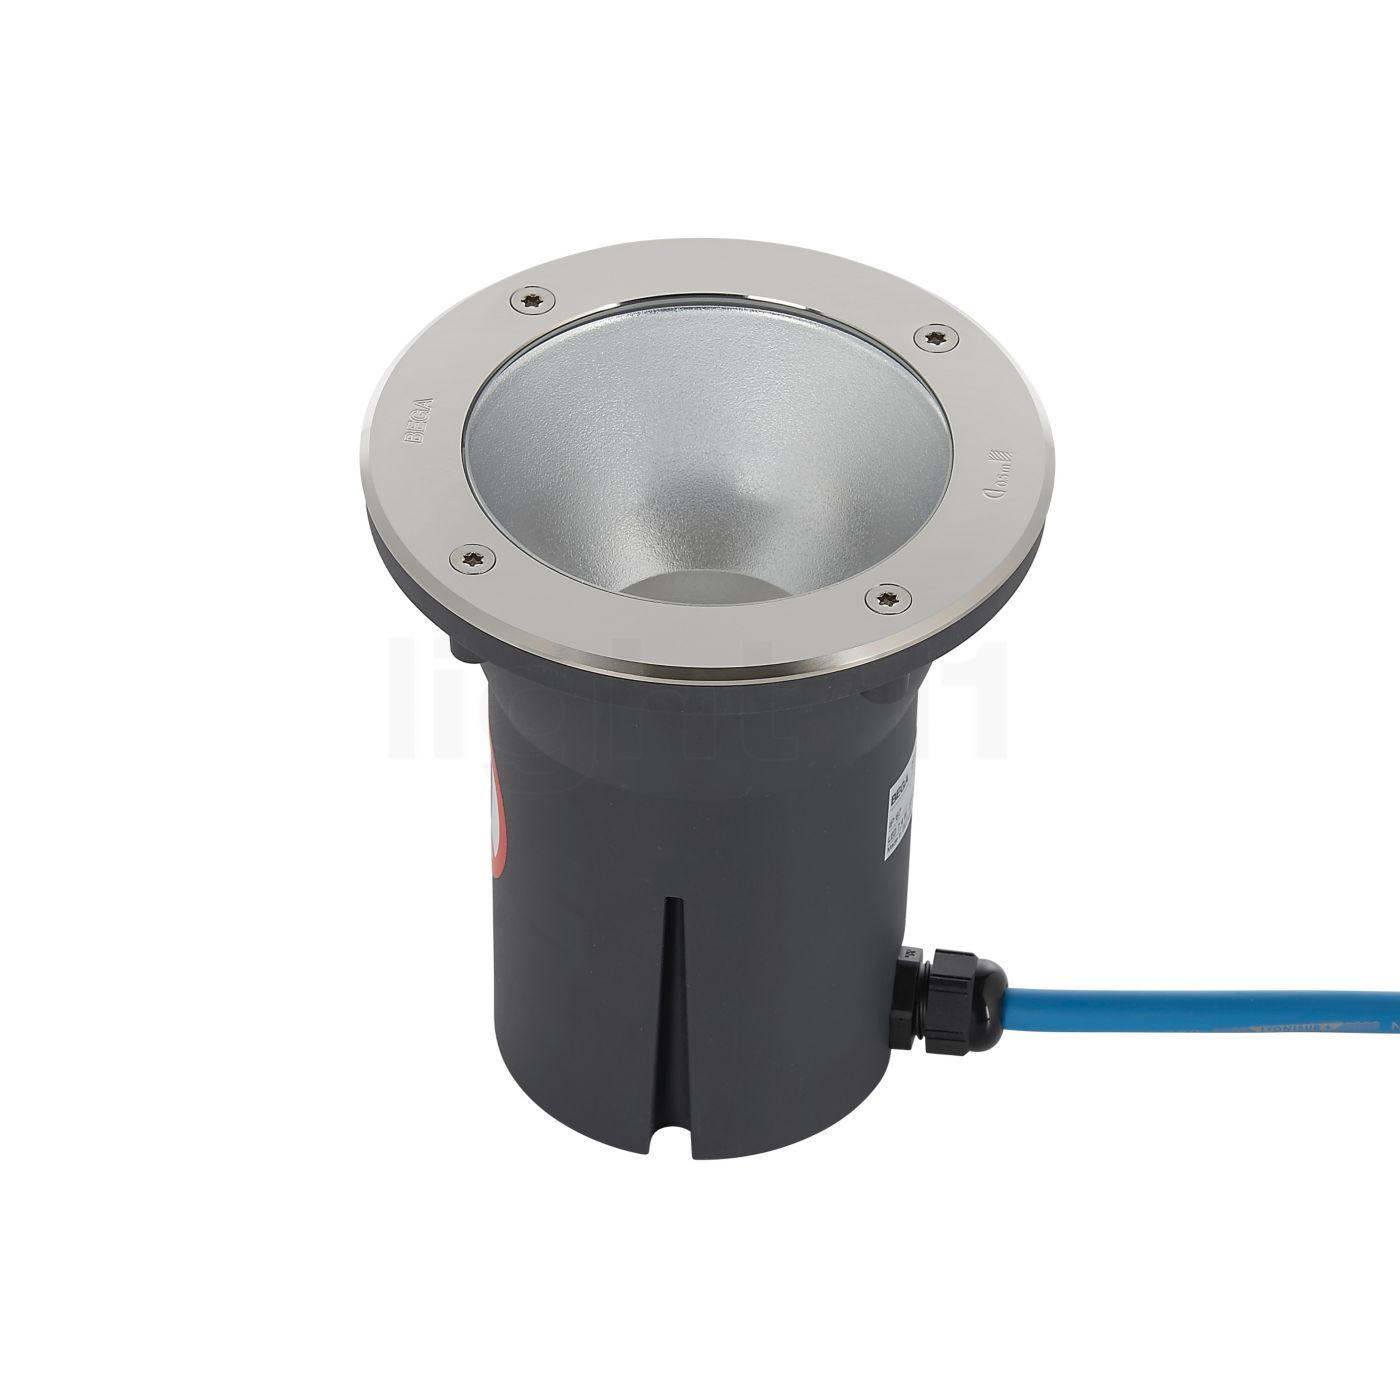 Bega 77011 - Bodeneinbauleuchte LED kaufen bei light11.de